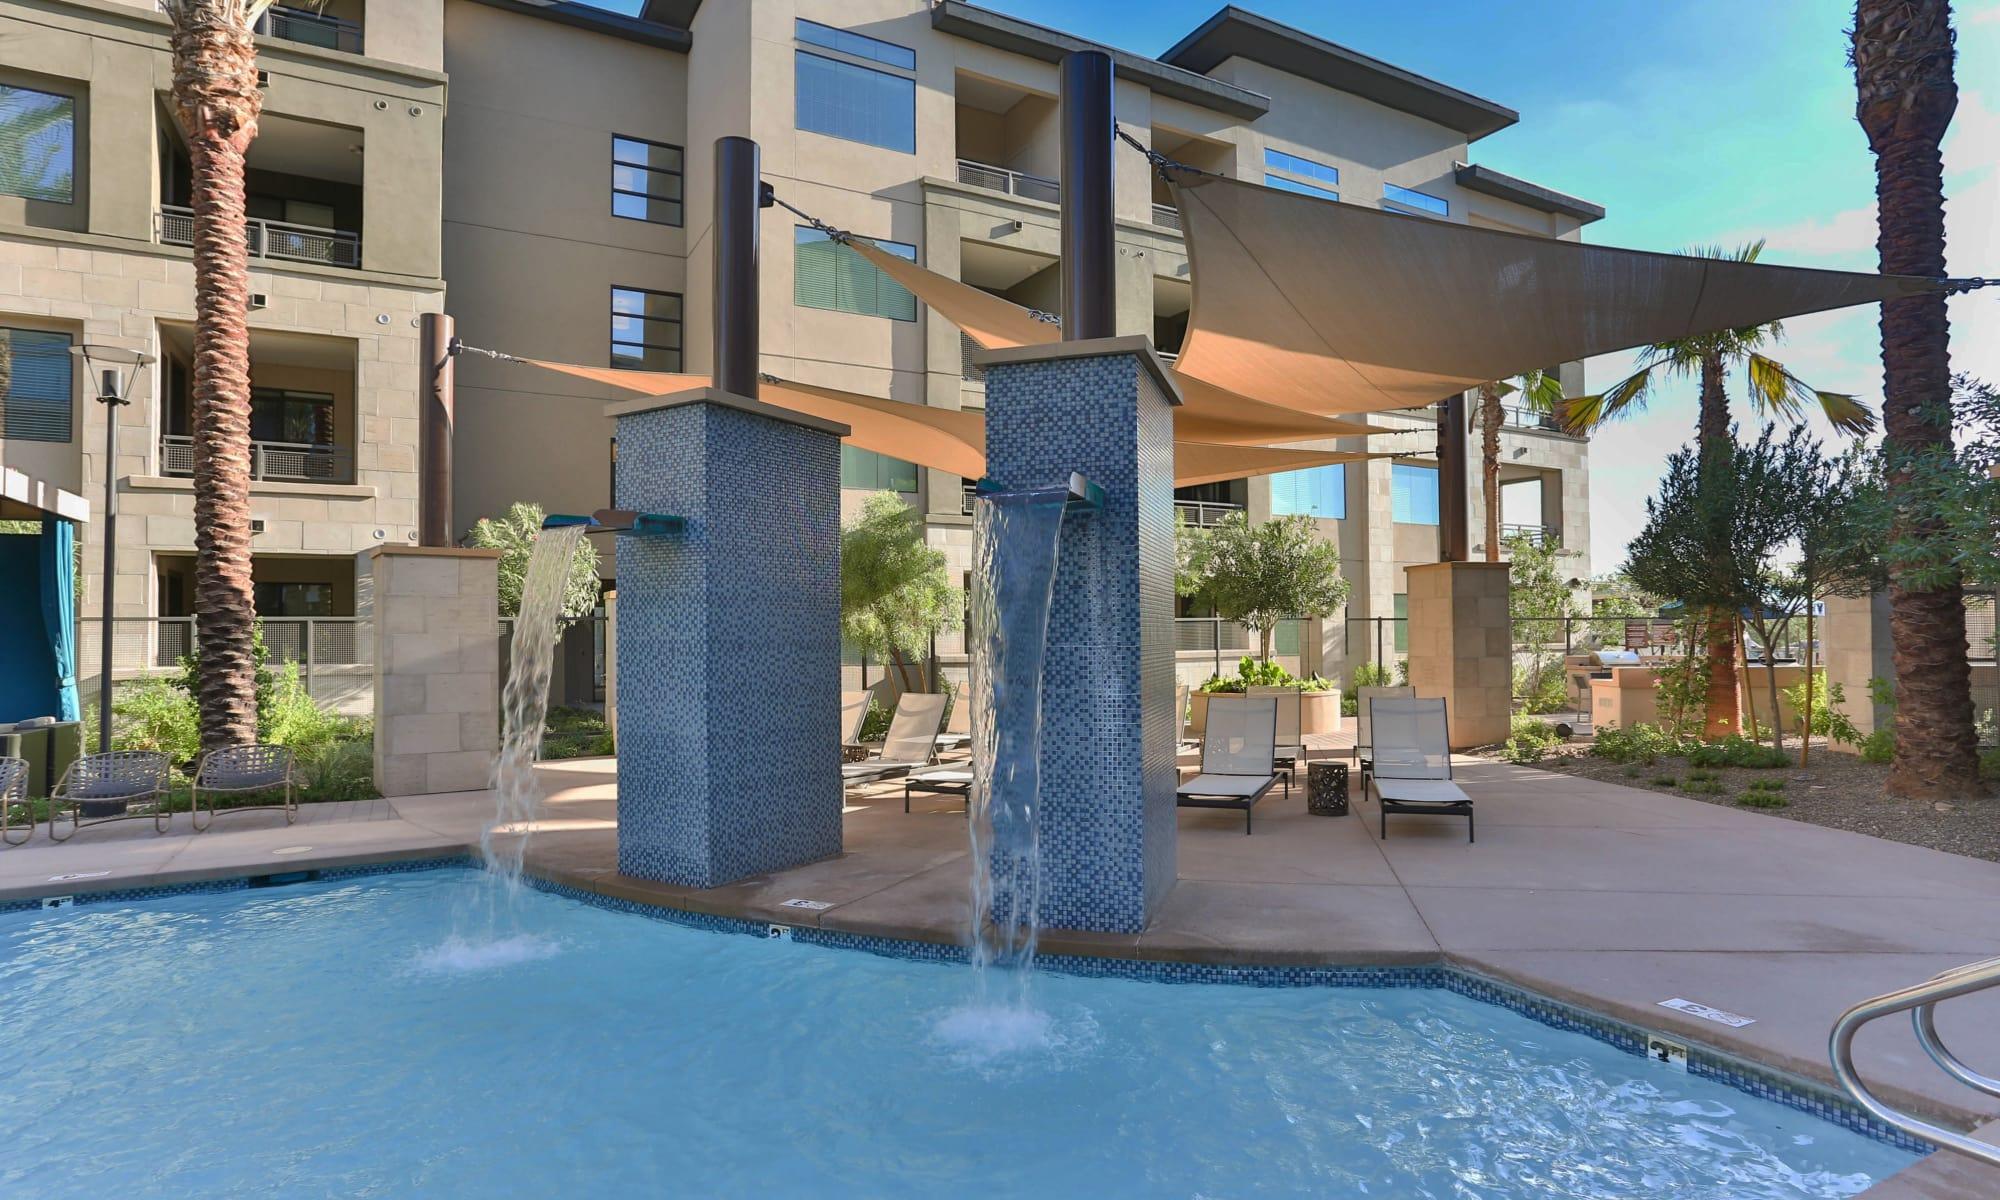 Avant at Fashion Center apartments in Chandler, Arizona